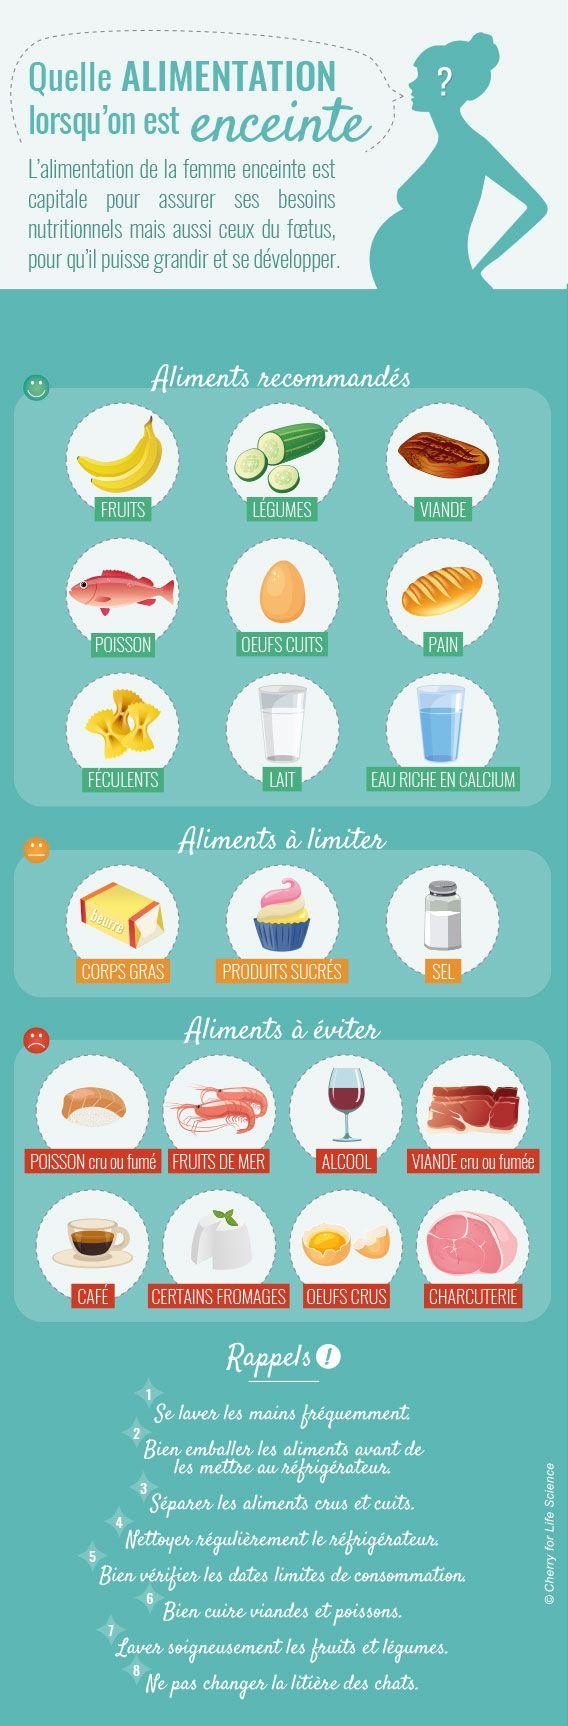 infographie : alimentation femme enceinte